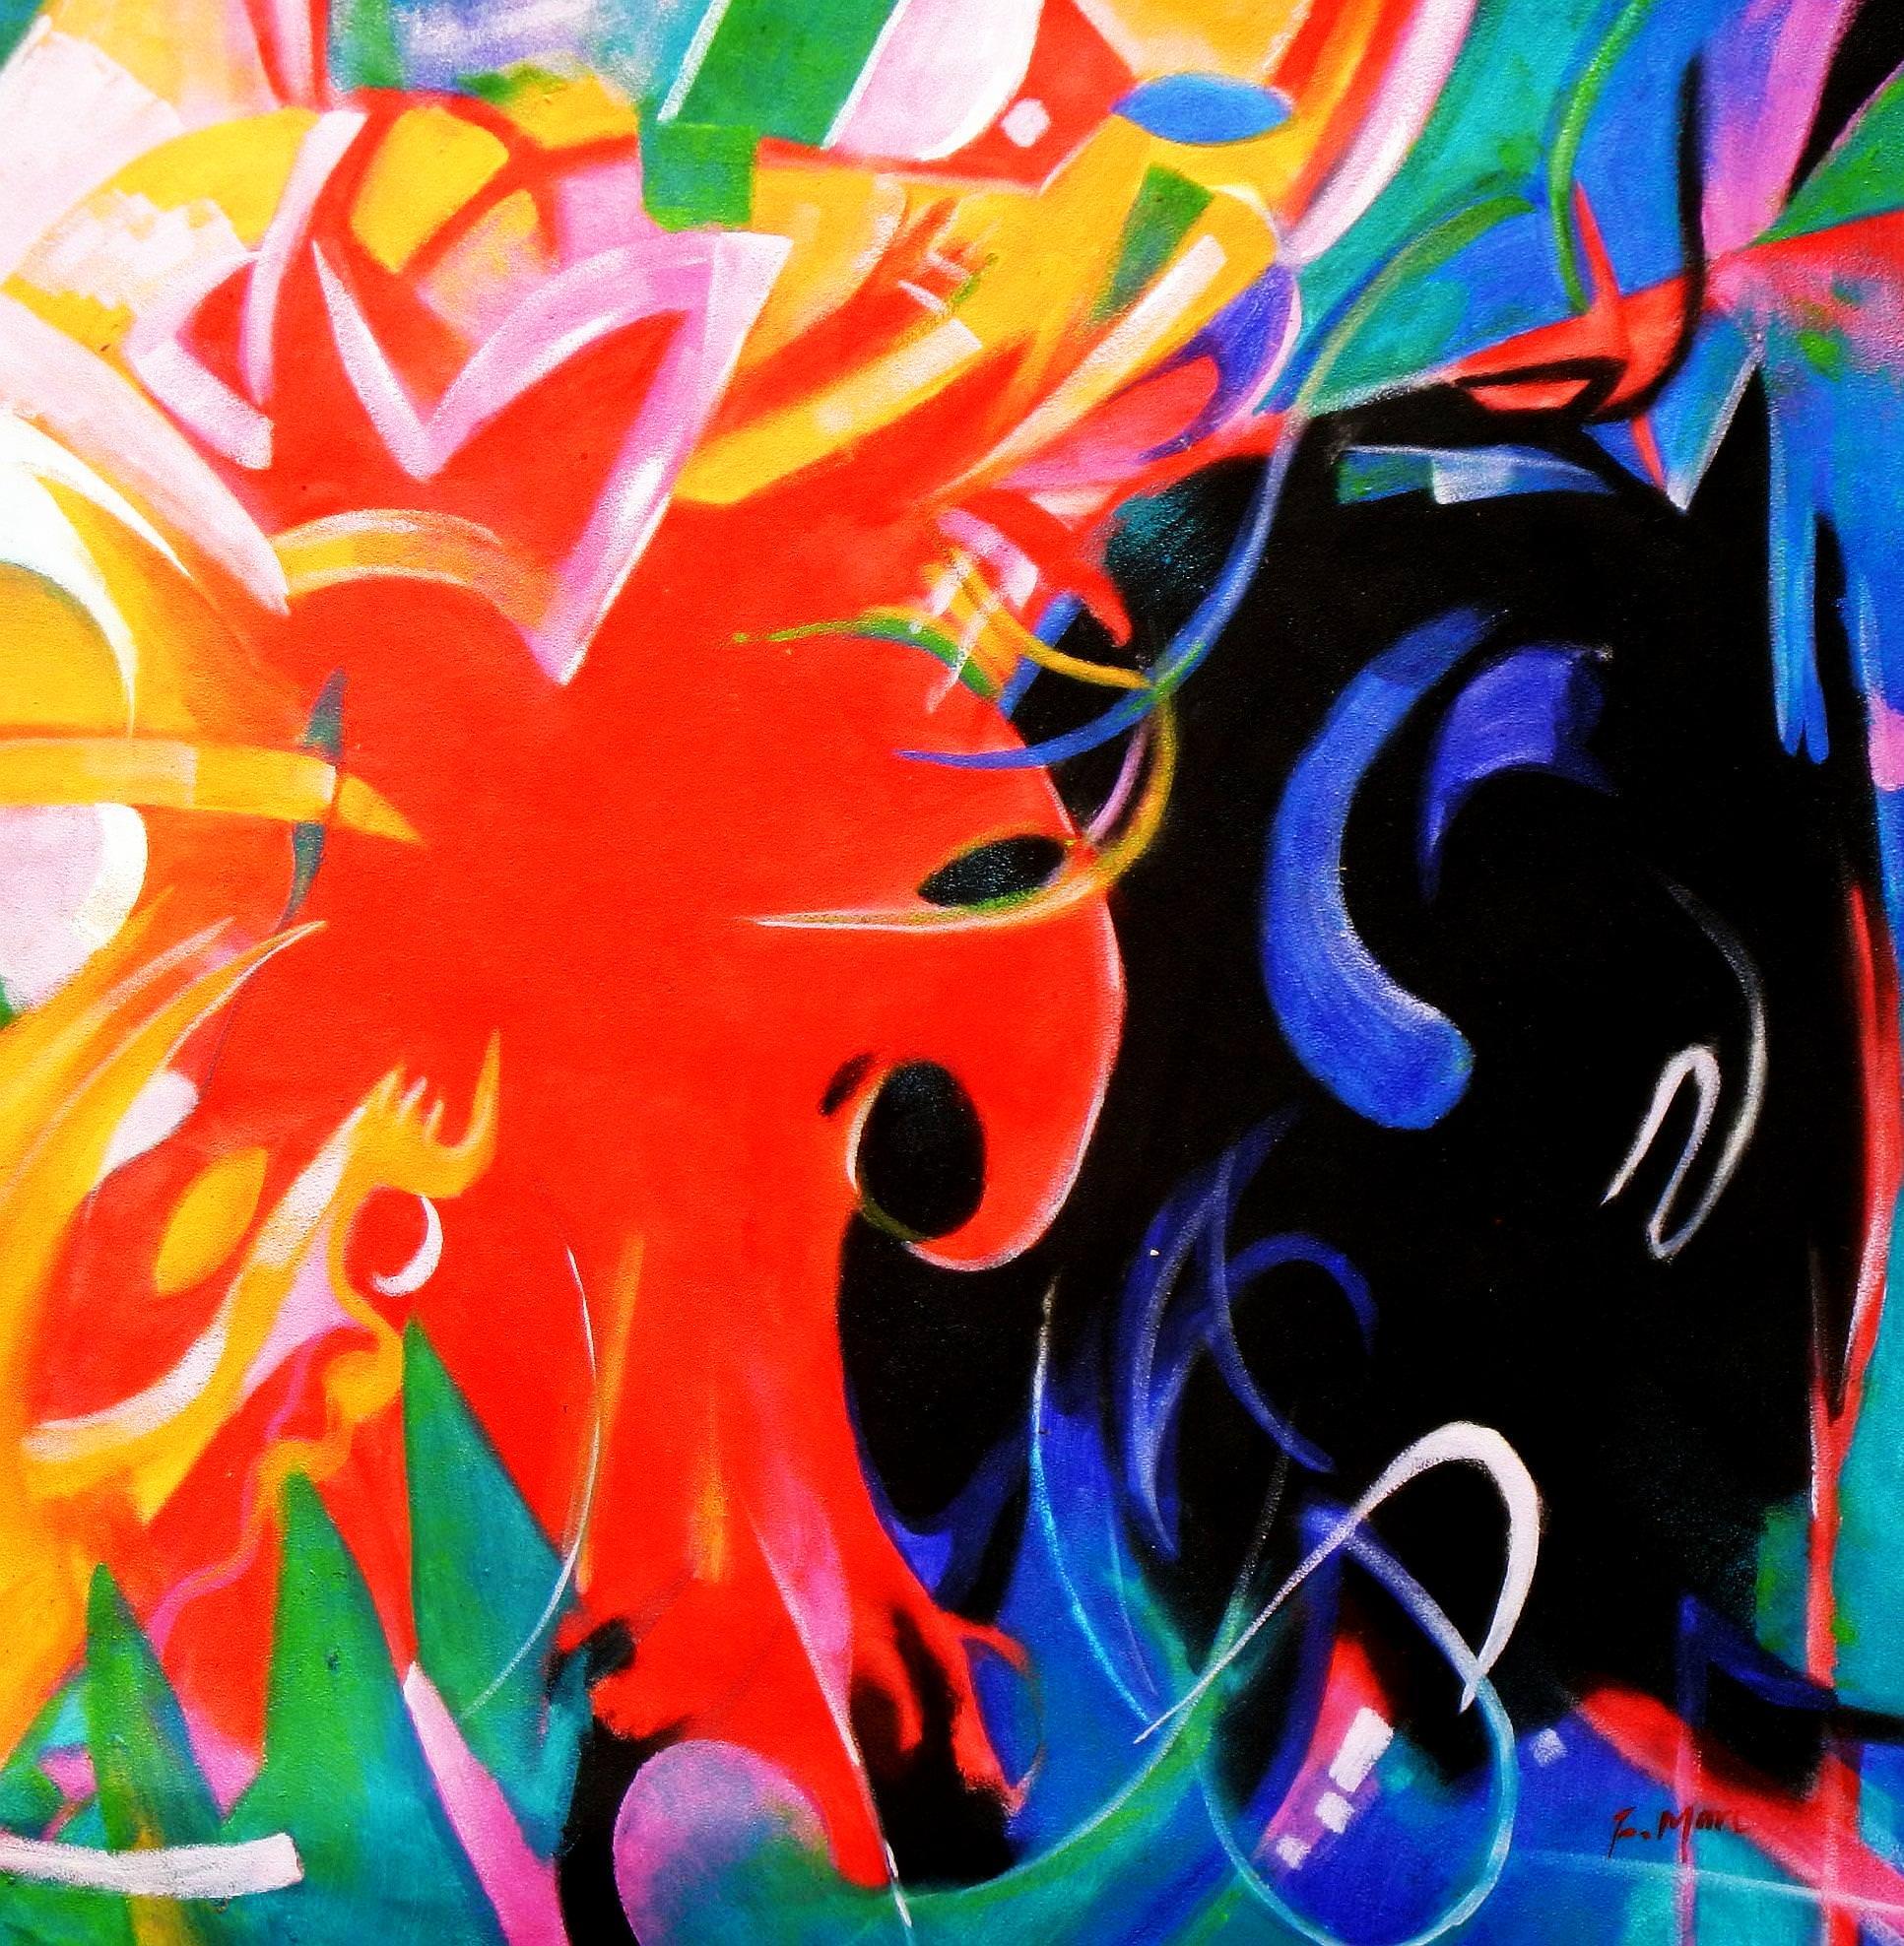 Franz Marc - Fighting Forms g93486 G 80x80cm Expressionismus Ölgemälde